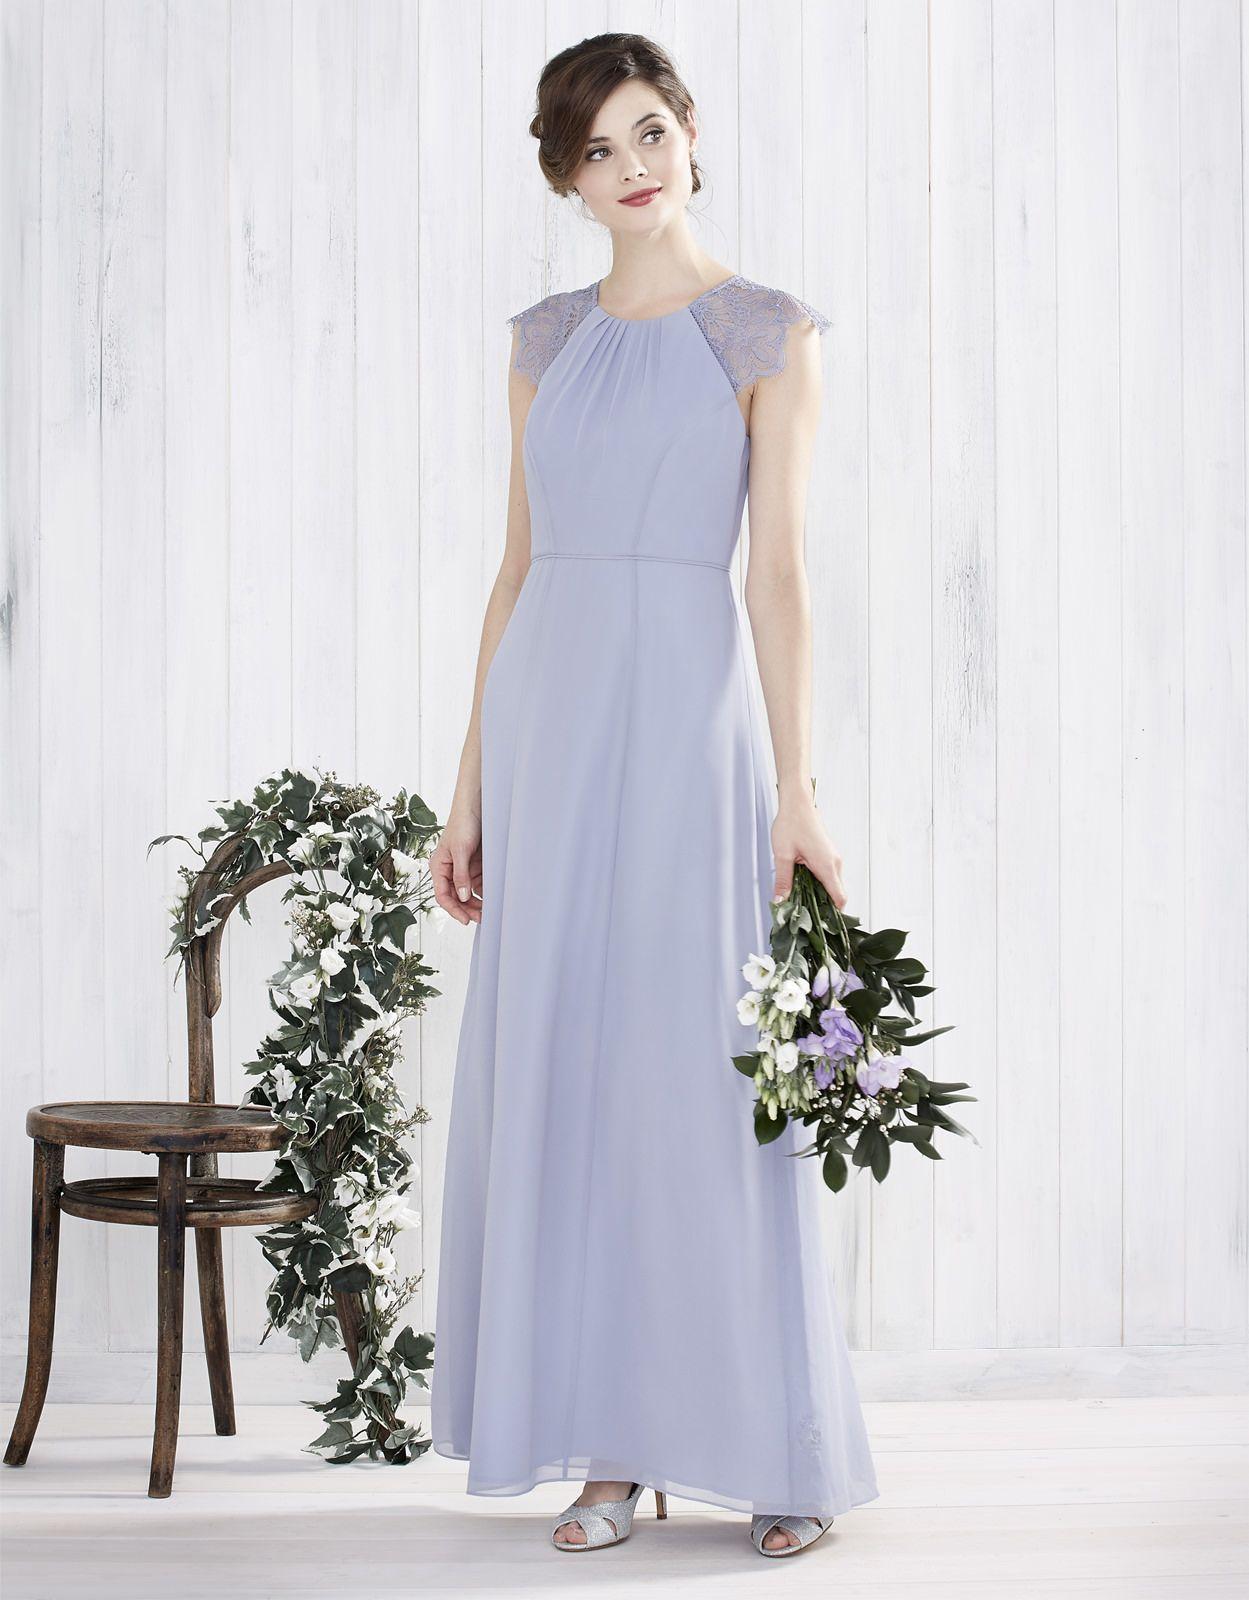 Bridesmaids maids wedding blog and weddings